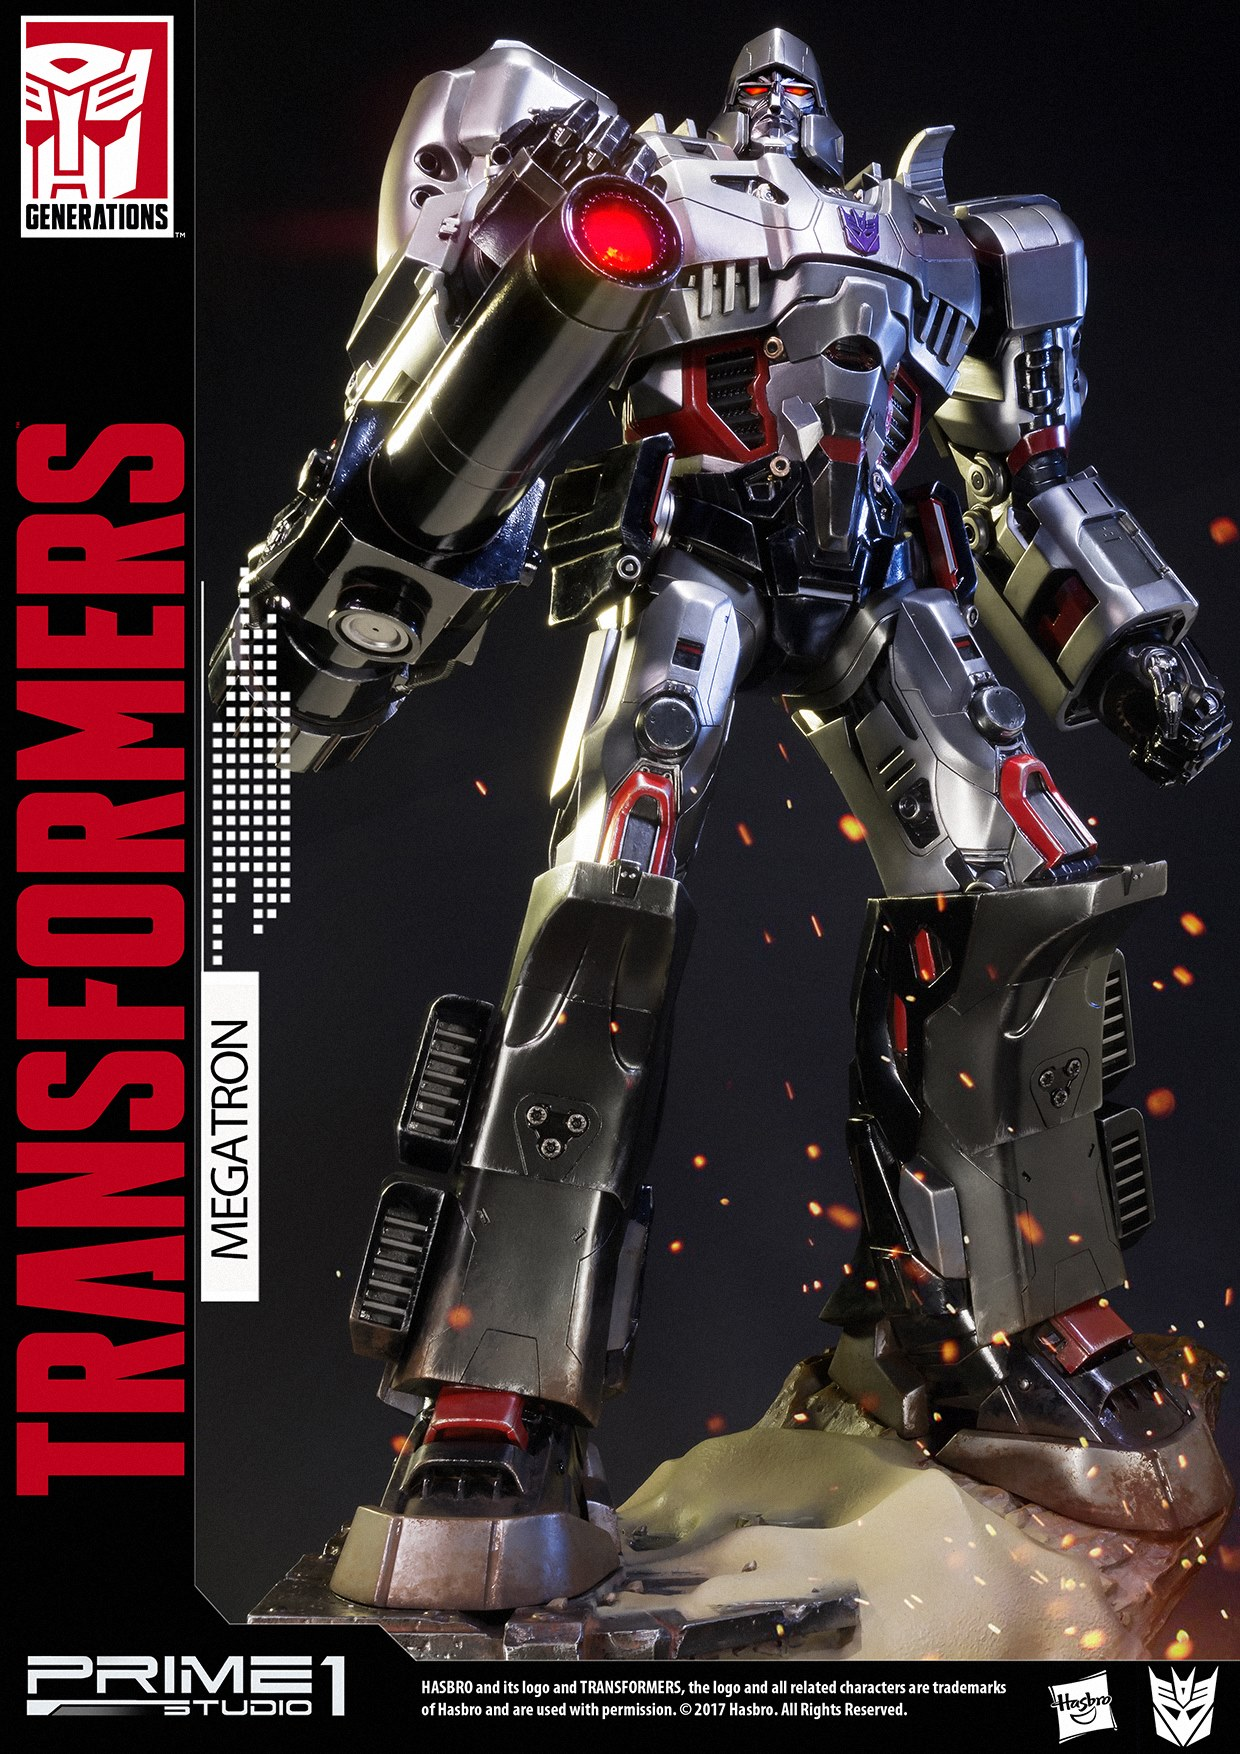 prime 1 transformers megatron generation 1 statue misc comic book